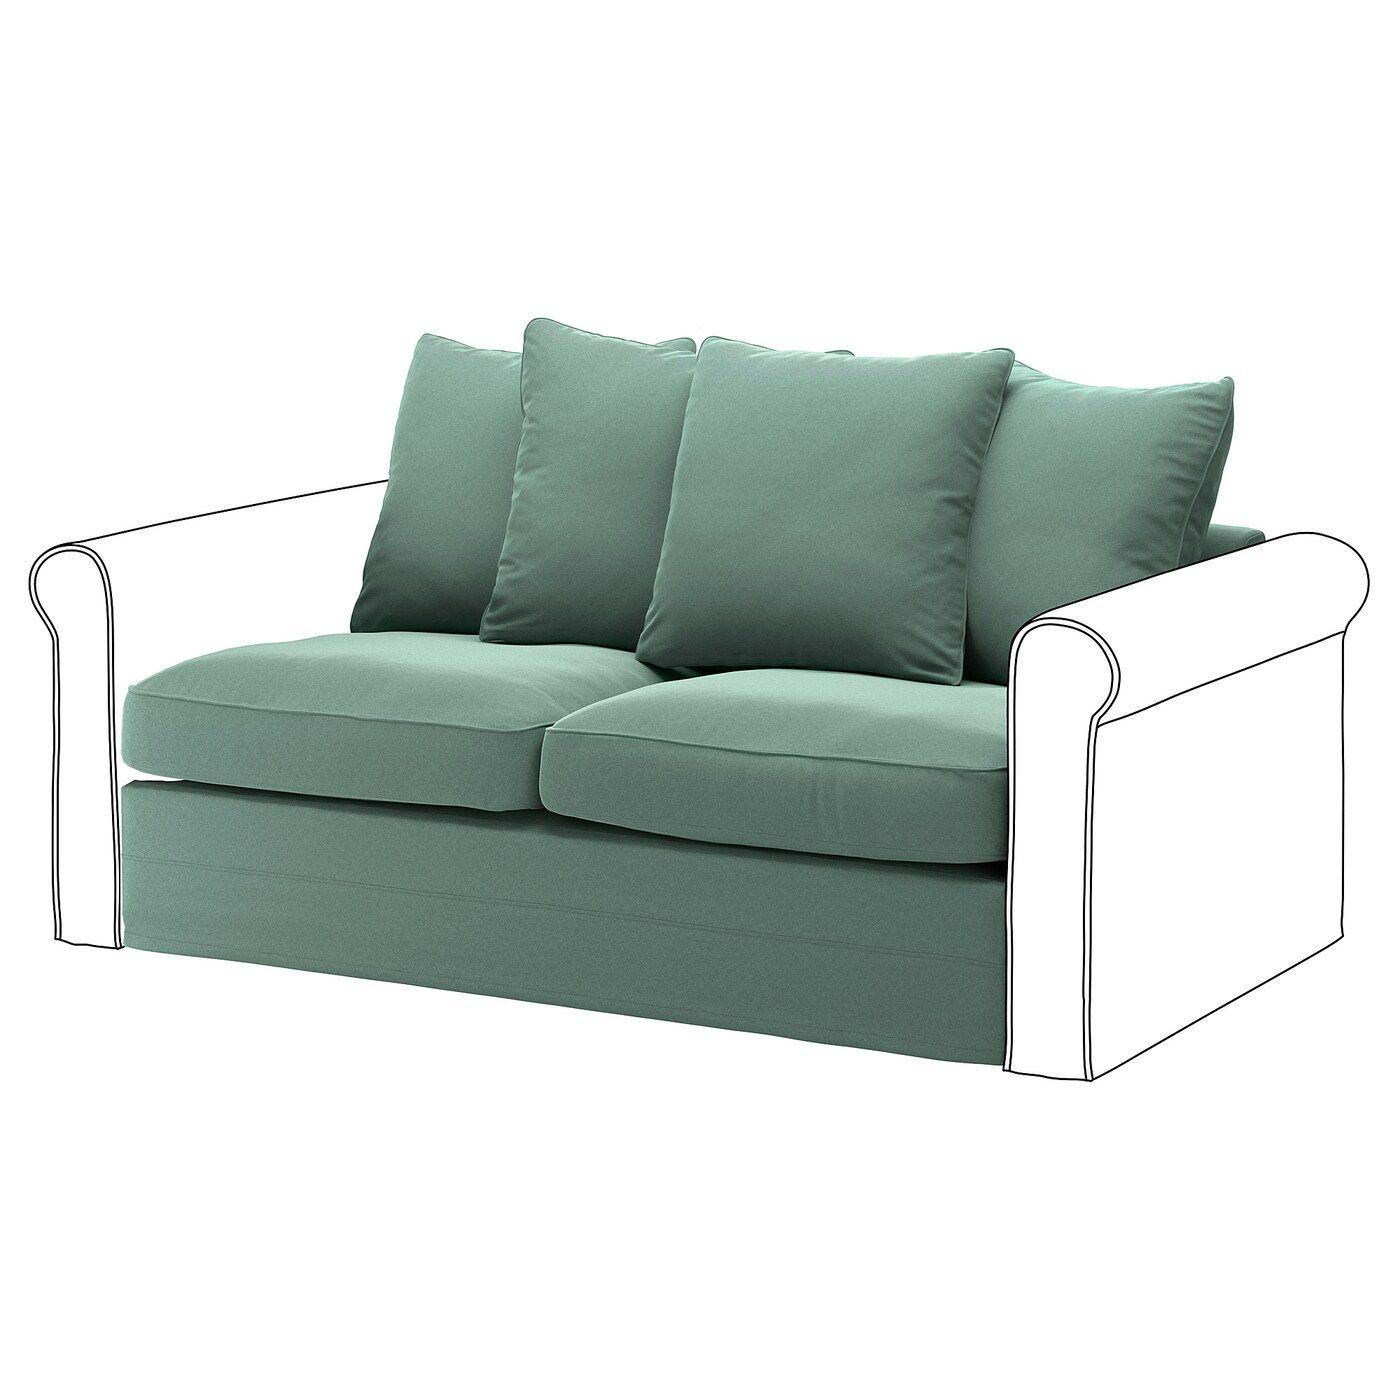 Gronlid Funda Sofa Cama 2 Ljungen Verde Claro In 2020 Kleines